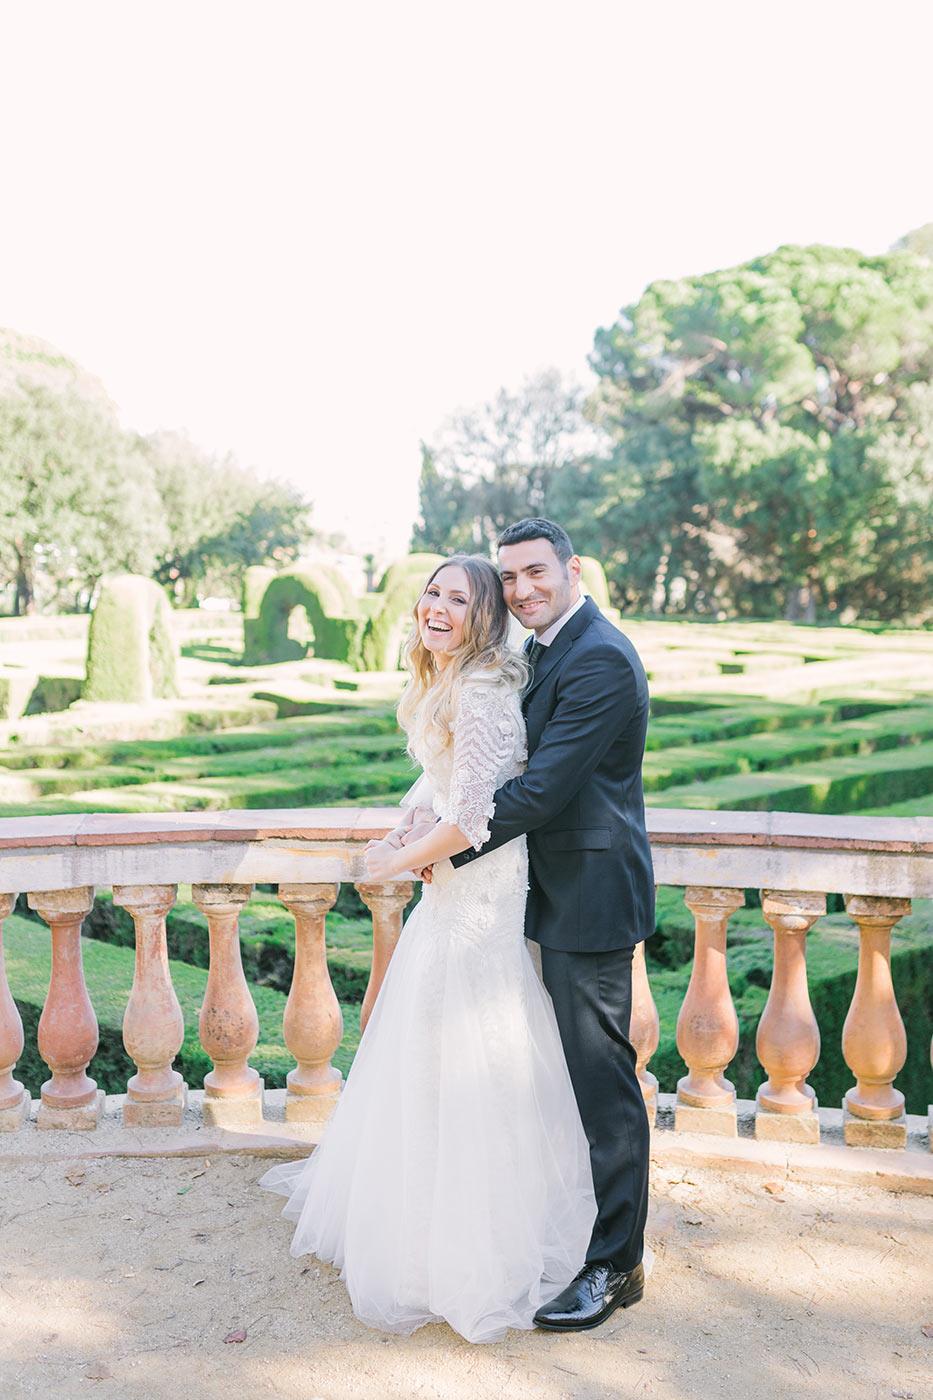 Beautiful young couple | Fine Art Photographer | Lena Karelova Photography | Destination Wedding Photographer Barcelona |Film Wedding Photographer